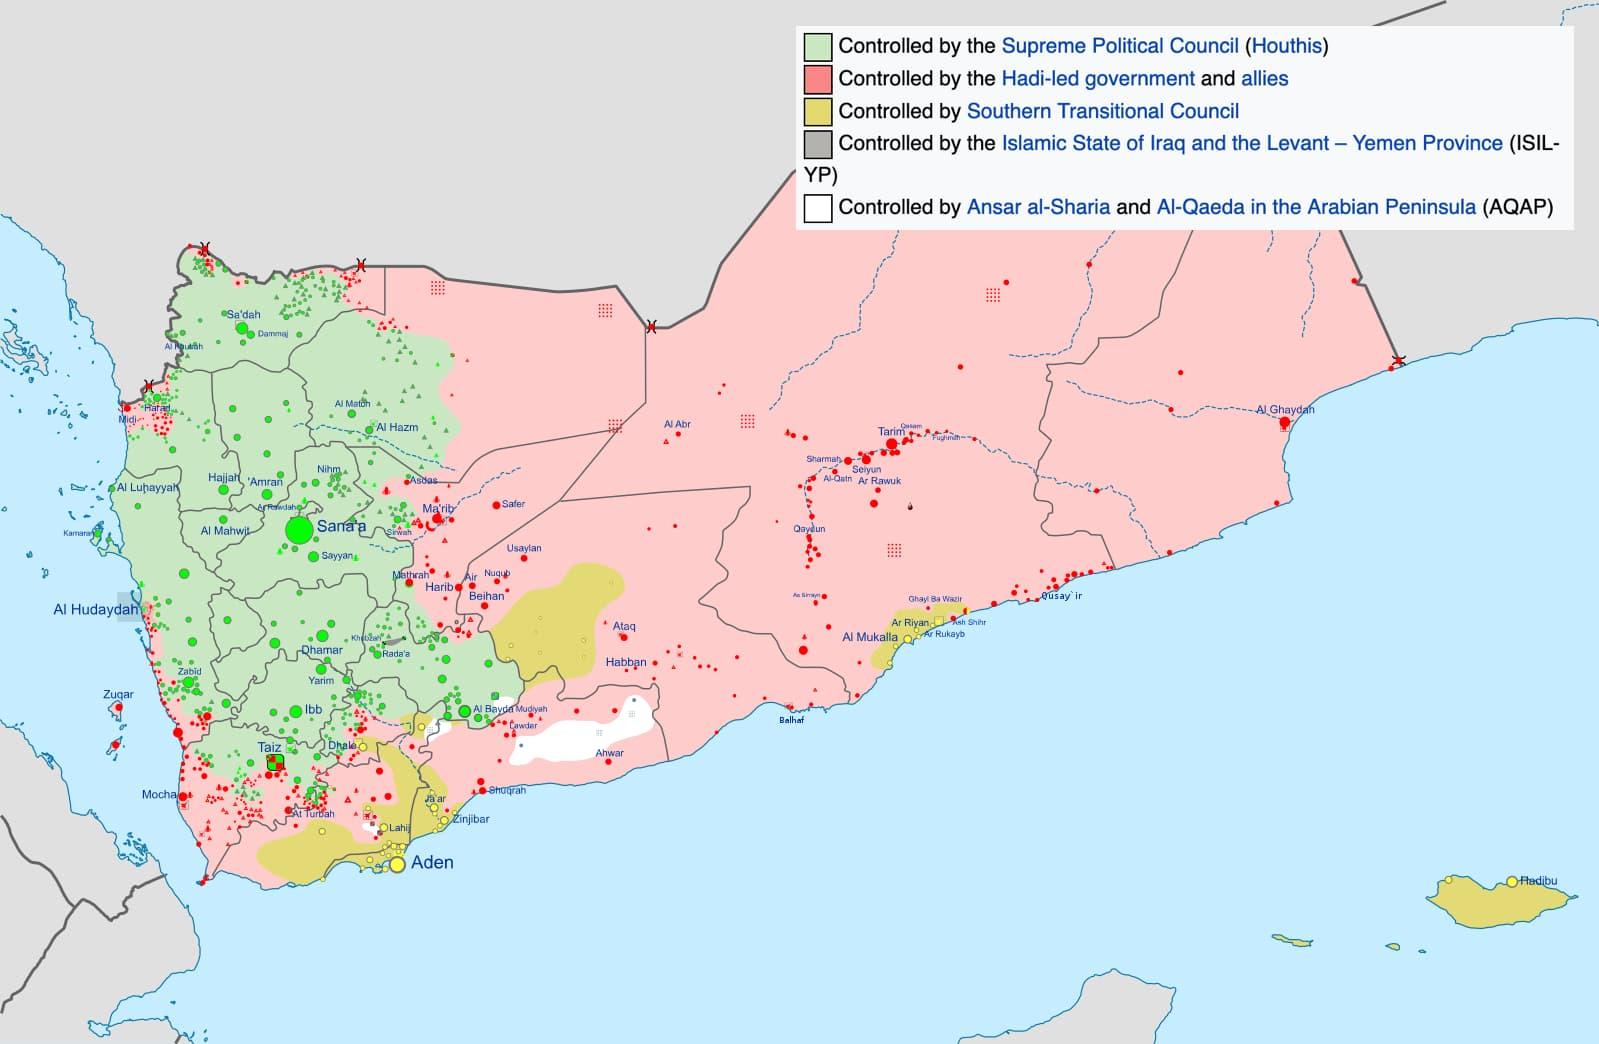 Zonas de control en Yemen. Fuente: Wikimedia Commons.